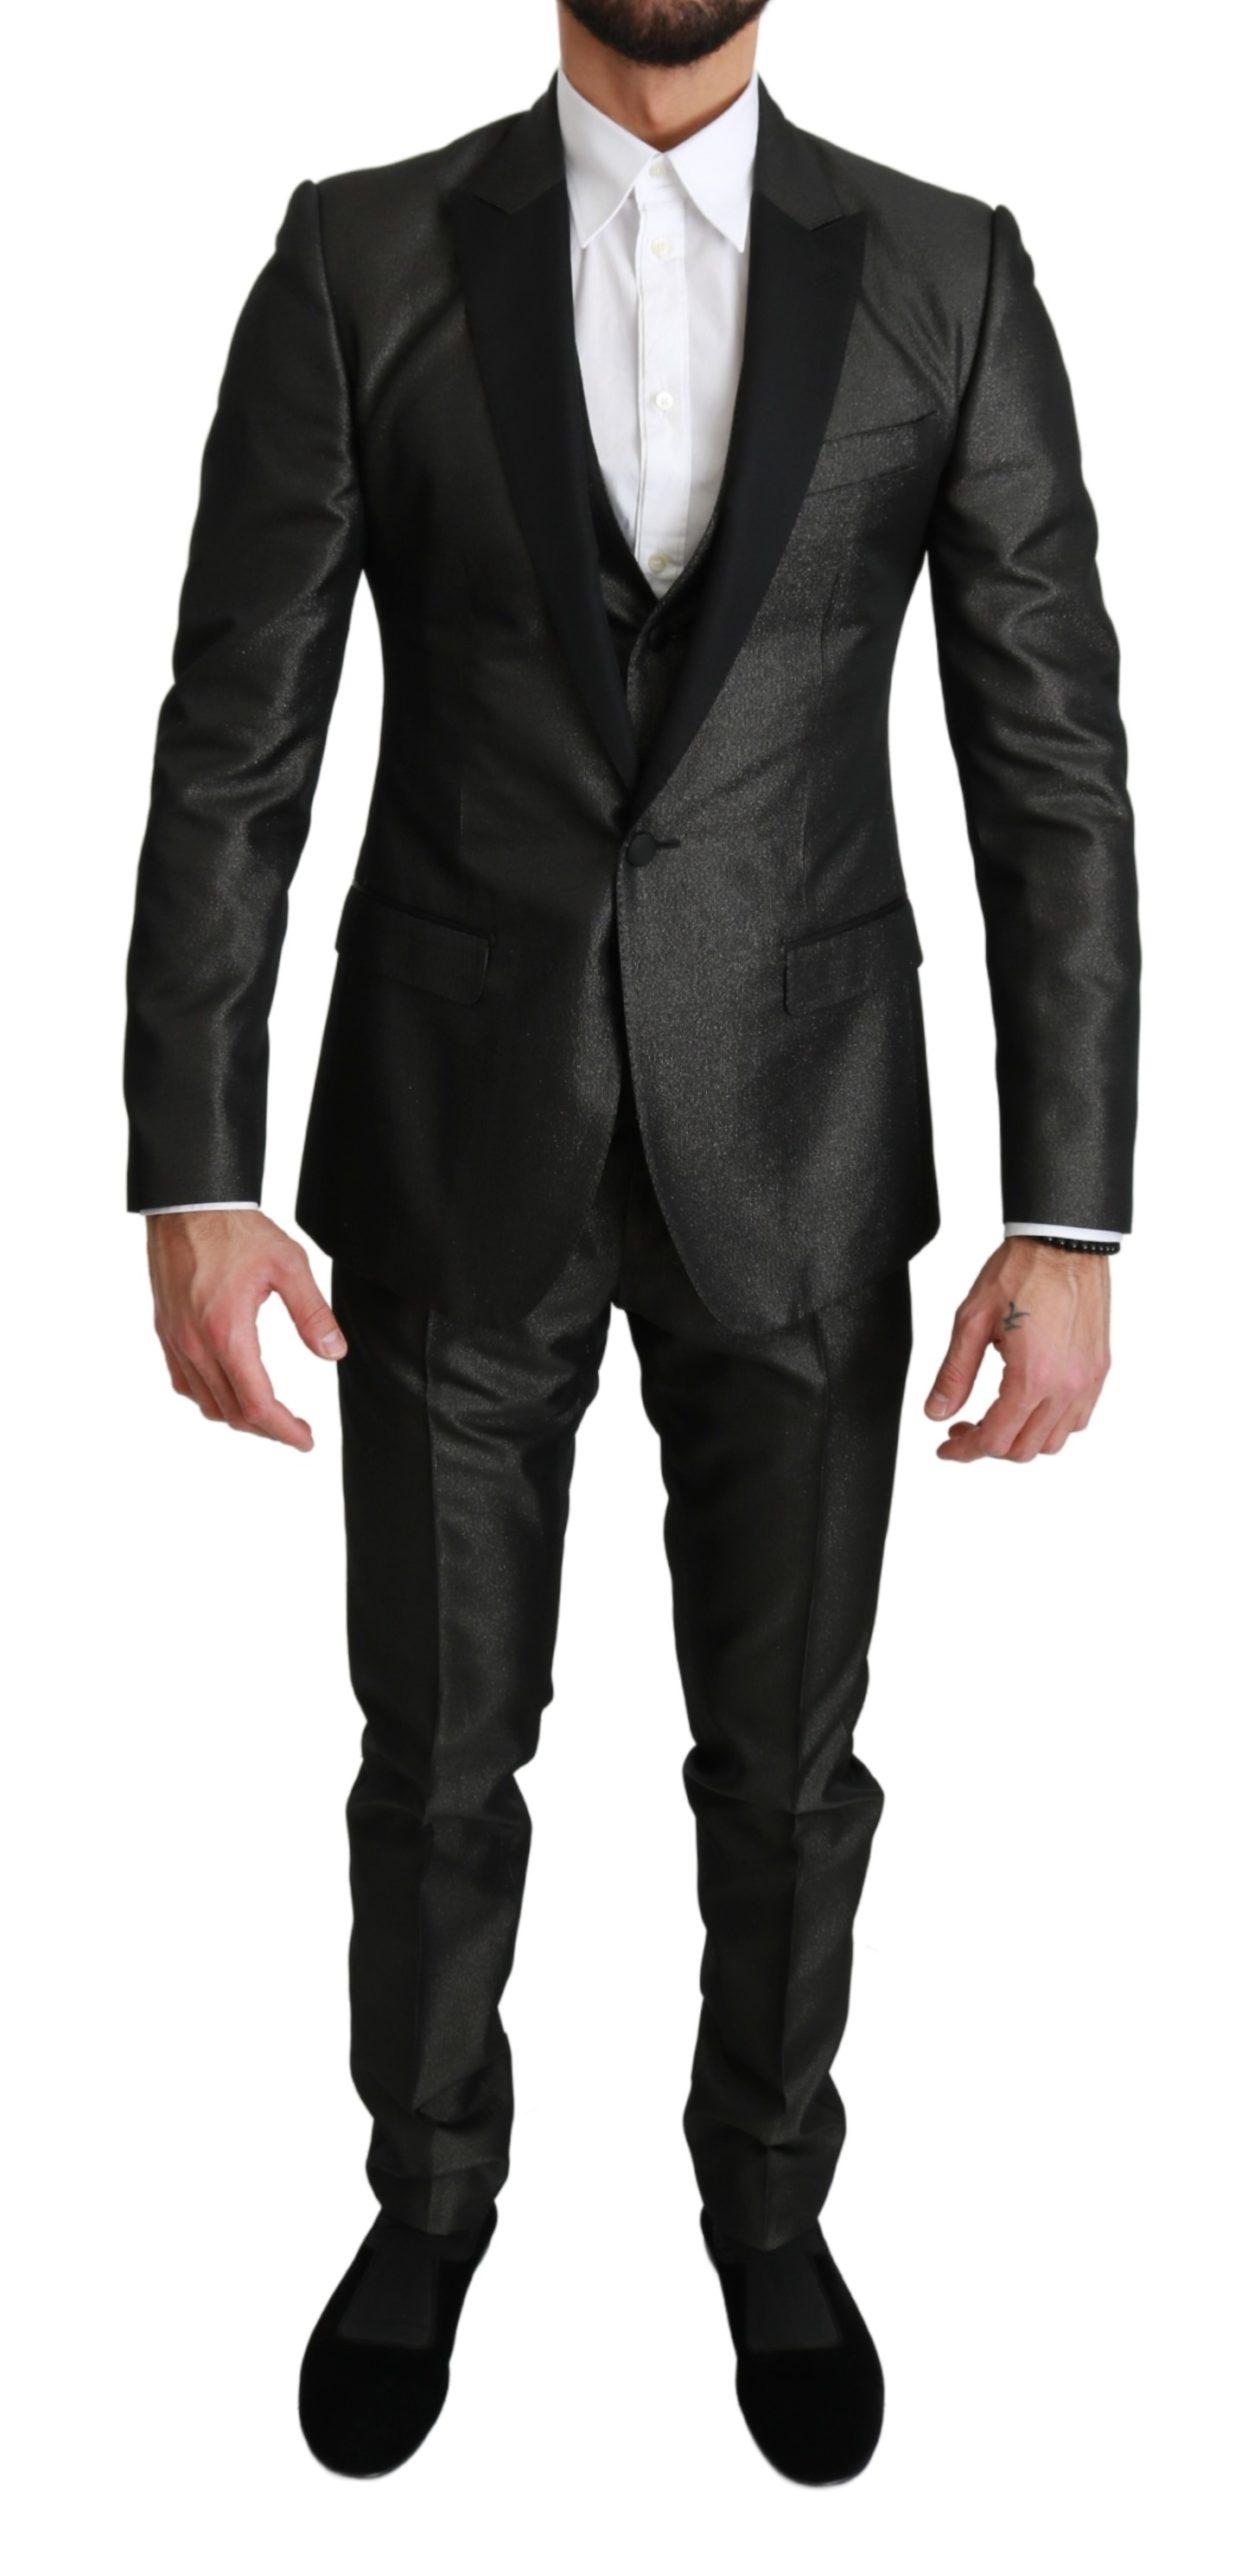 Dolce & Gabbana Men's Single Breasted 3 Piece MARTINI Suit Gray KOS1661 - IT44 | XS